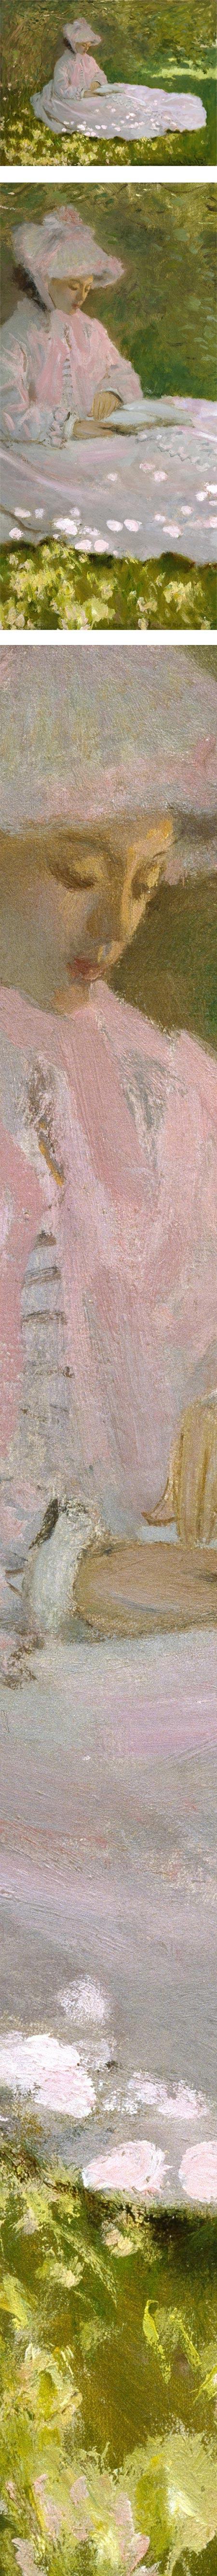 Springtime, Claude Monet, Impressionist oil painting